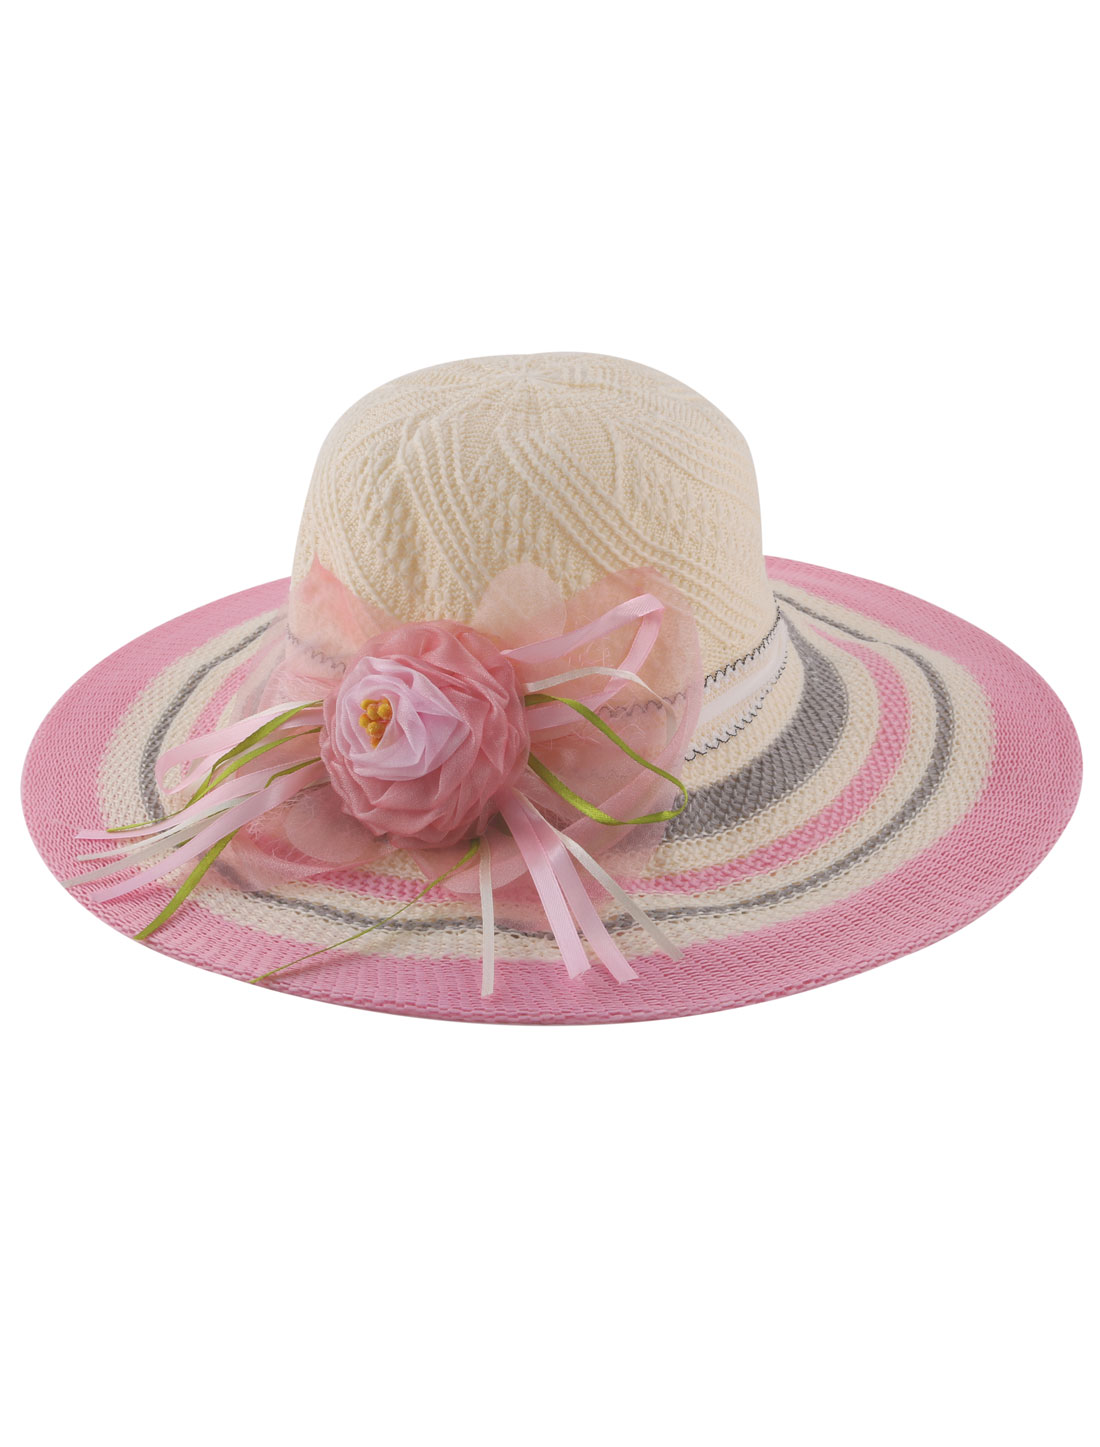 Lady Polyester Braided Pink Organza Floral Decor Chin Strap Beach Sun Hat Wide Brim Beige